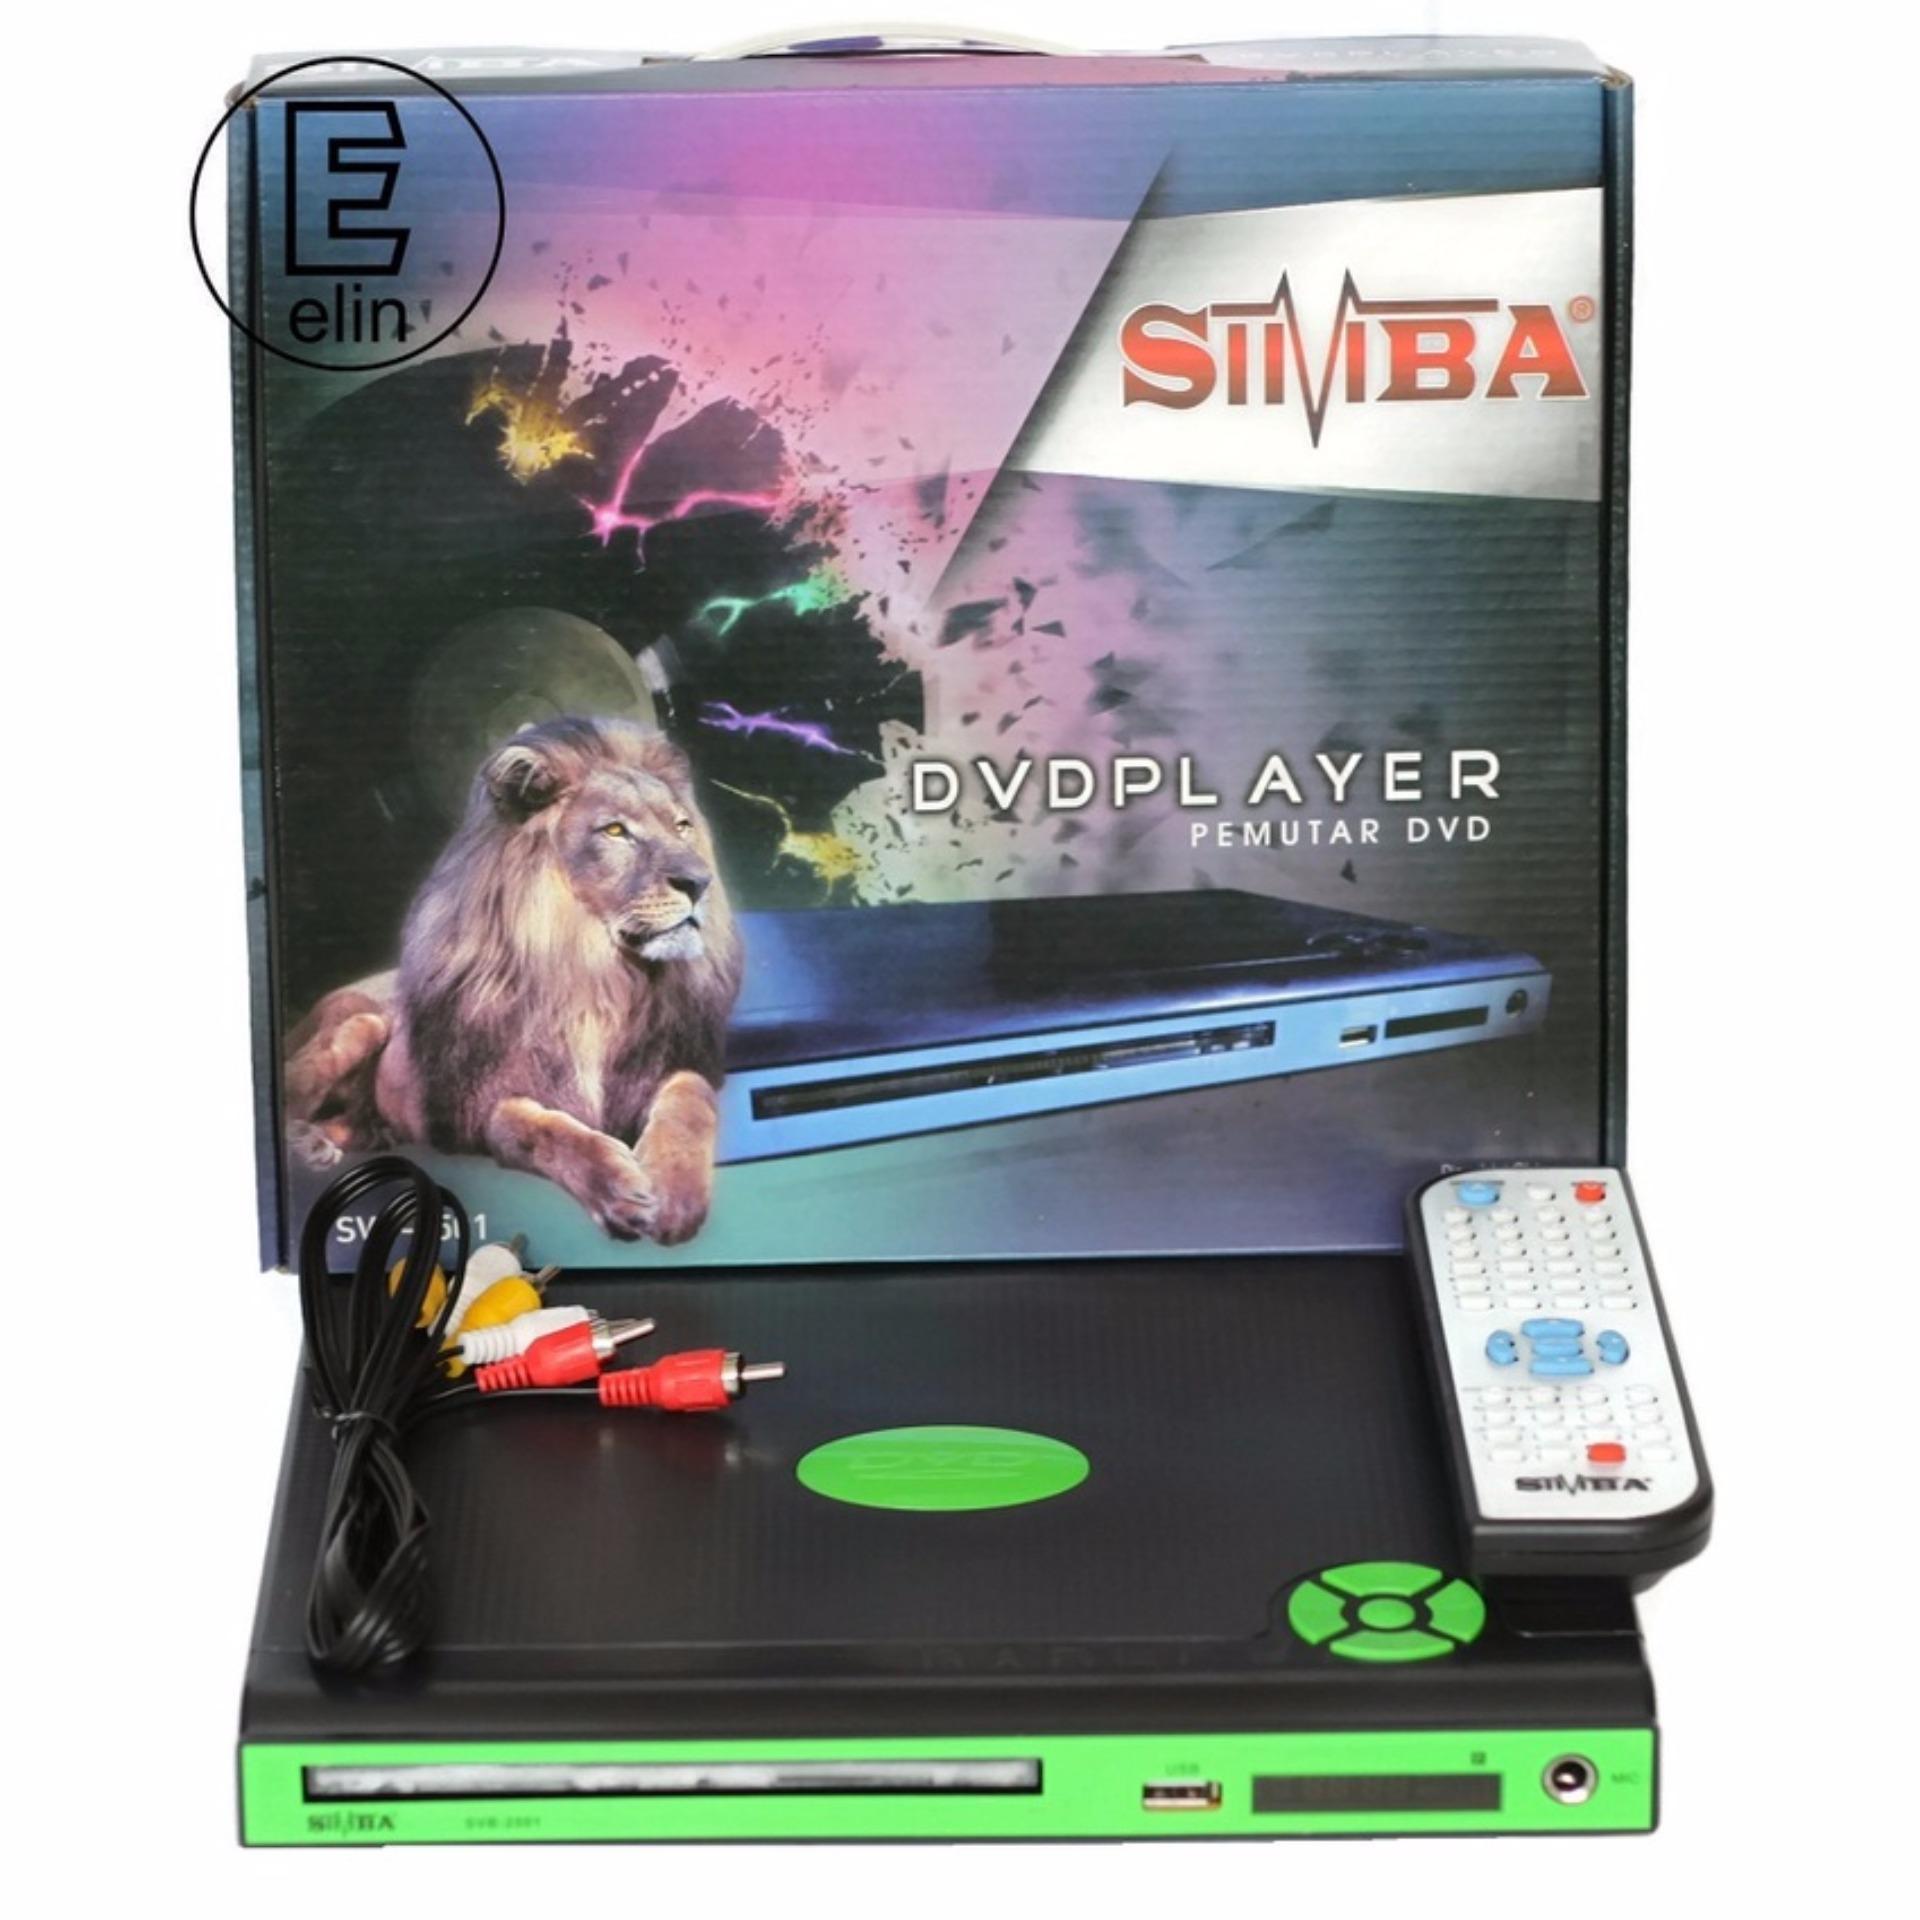 Harga Simba Dvd Player Svb 2501 Hitam Seken